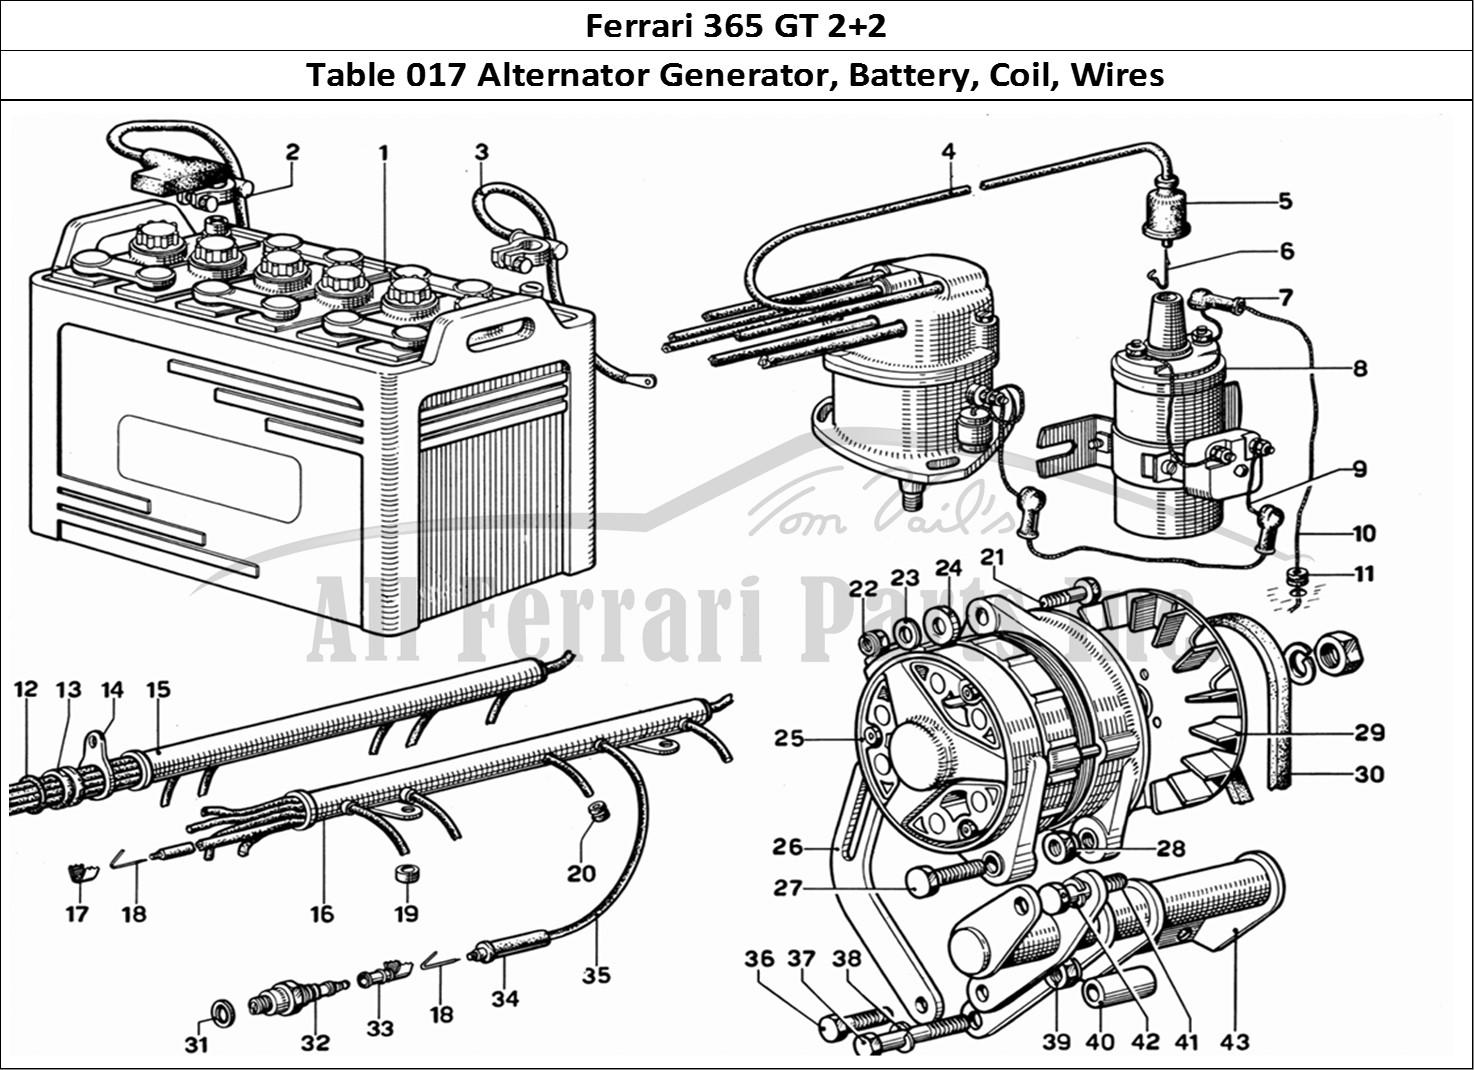 Buy Original Ferrari 365 Gt 2 2 017 Alternator Generator